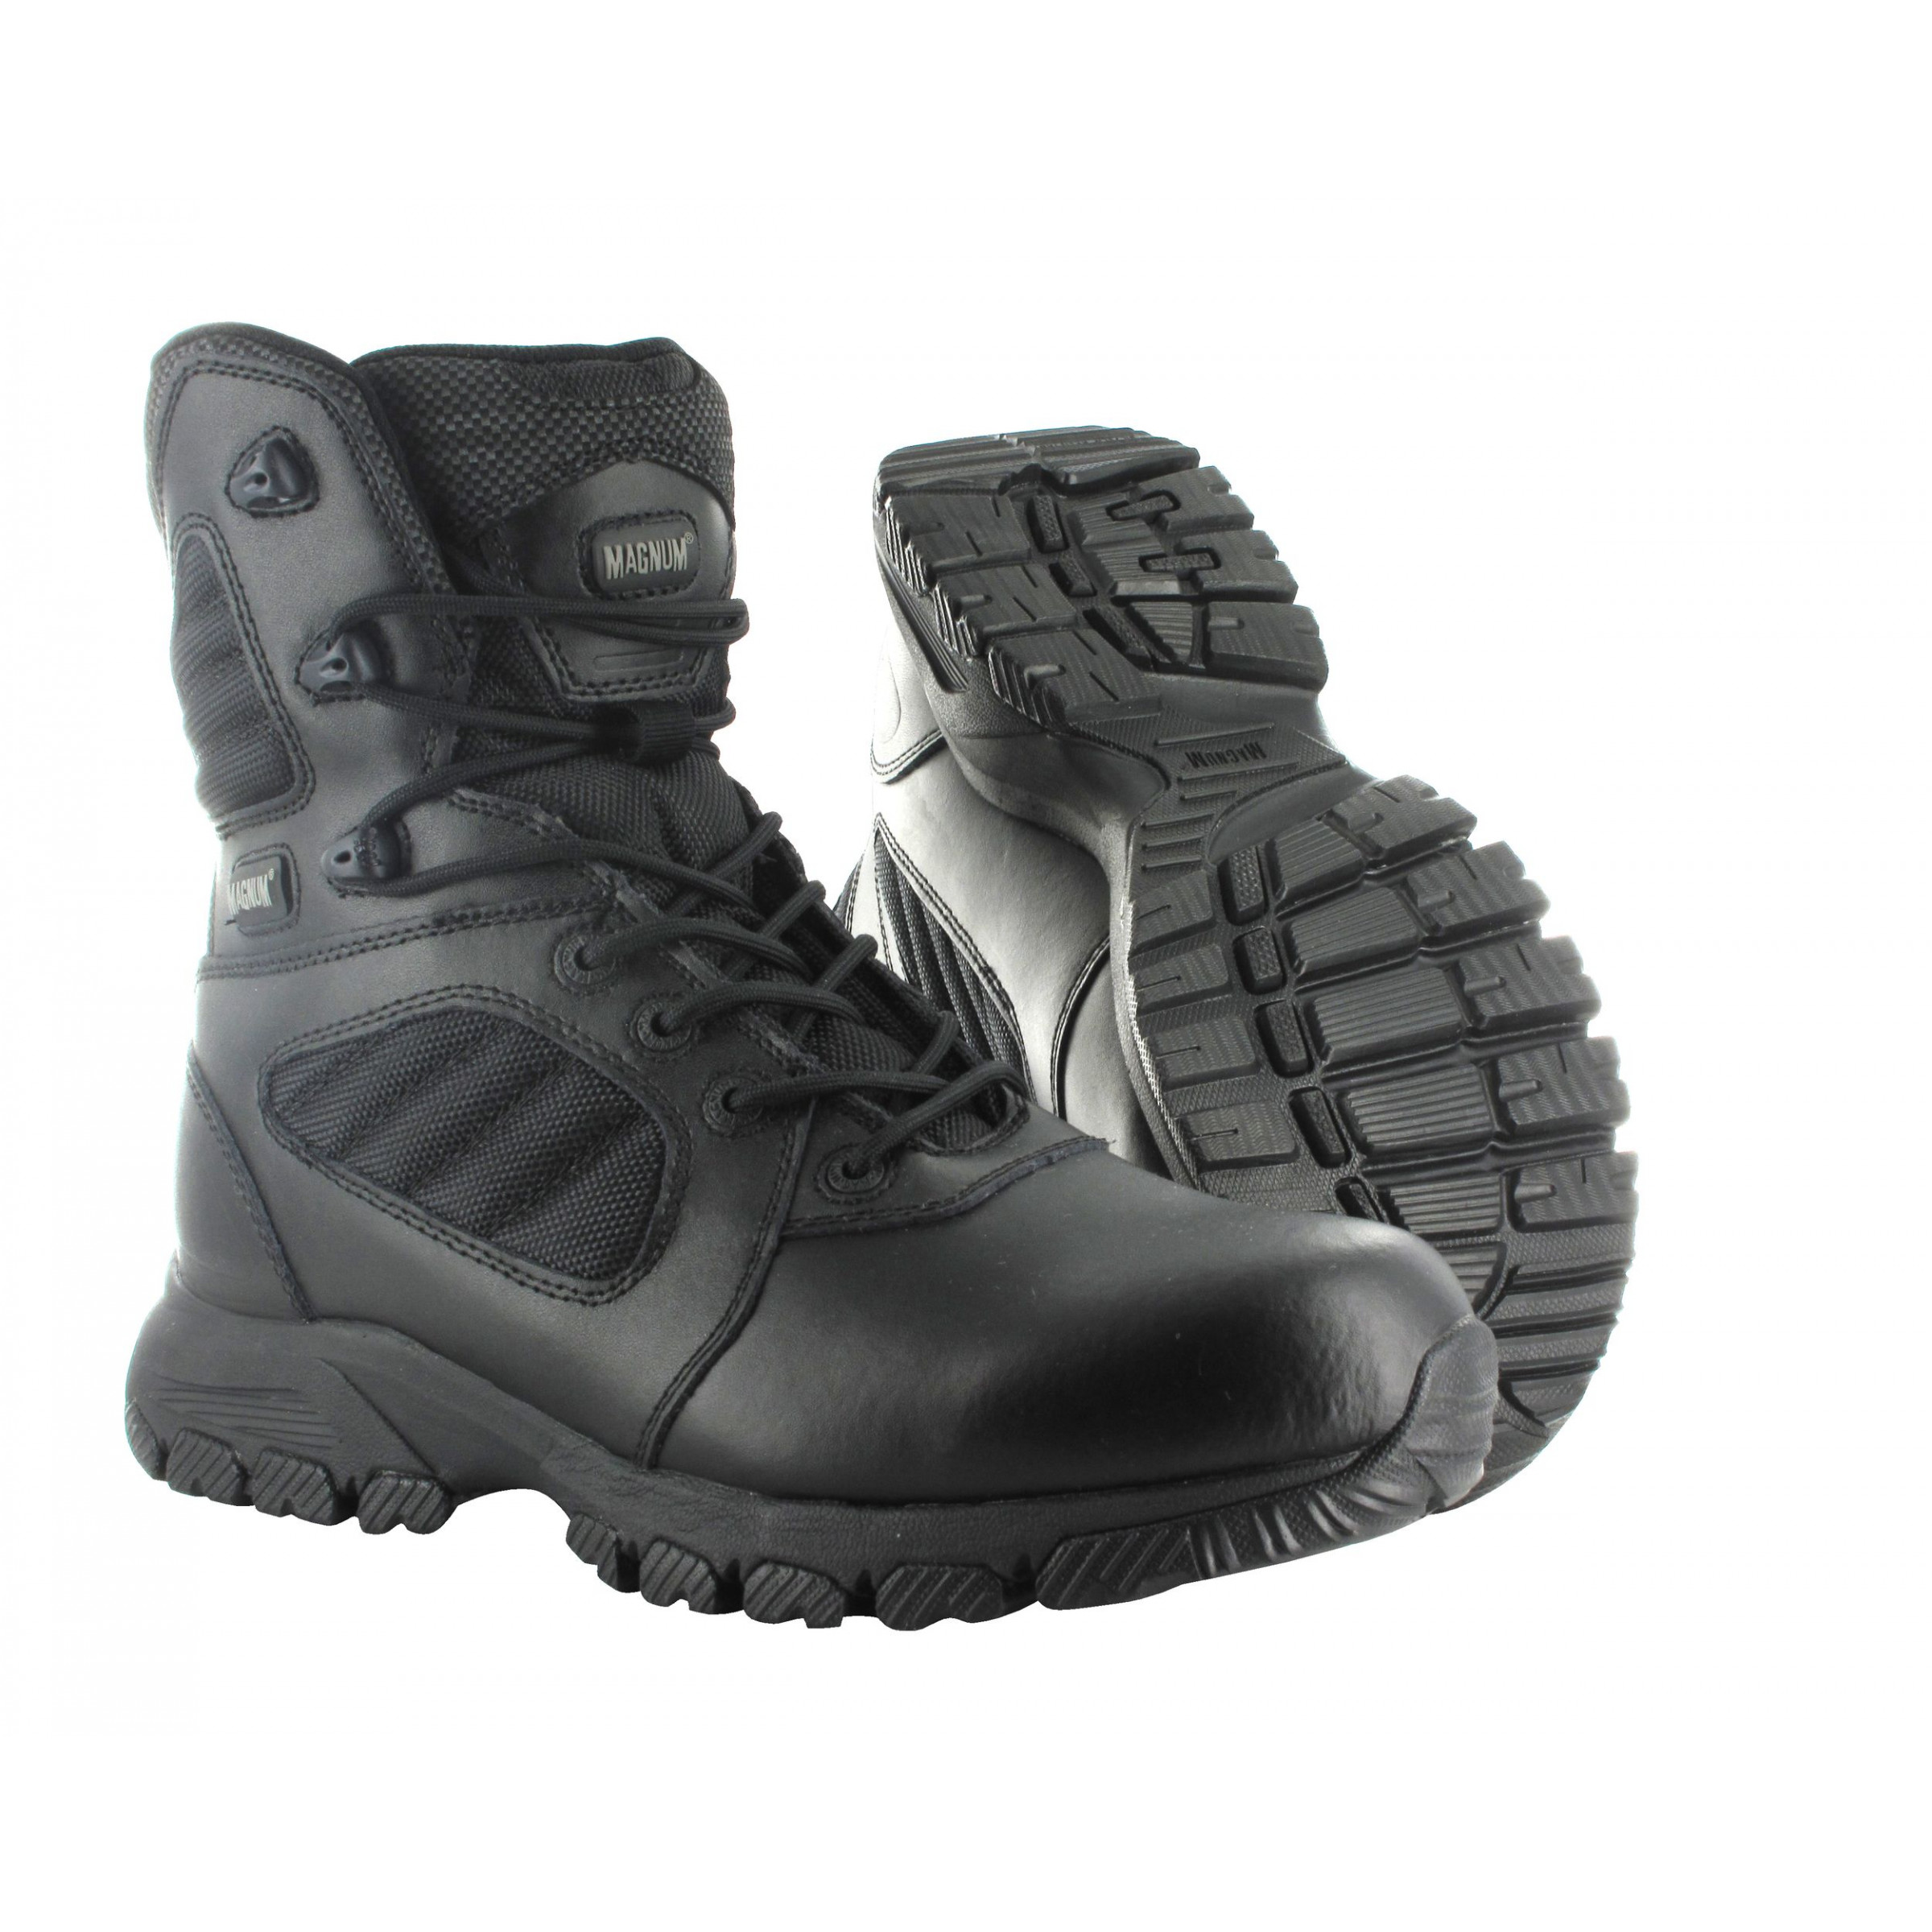 Chaussure Tactique Rangers Magnum LYNX 8.0